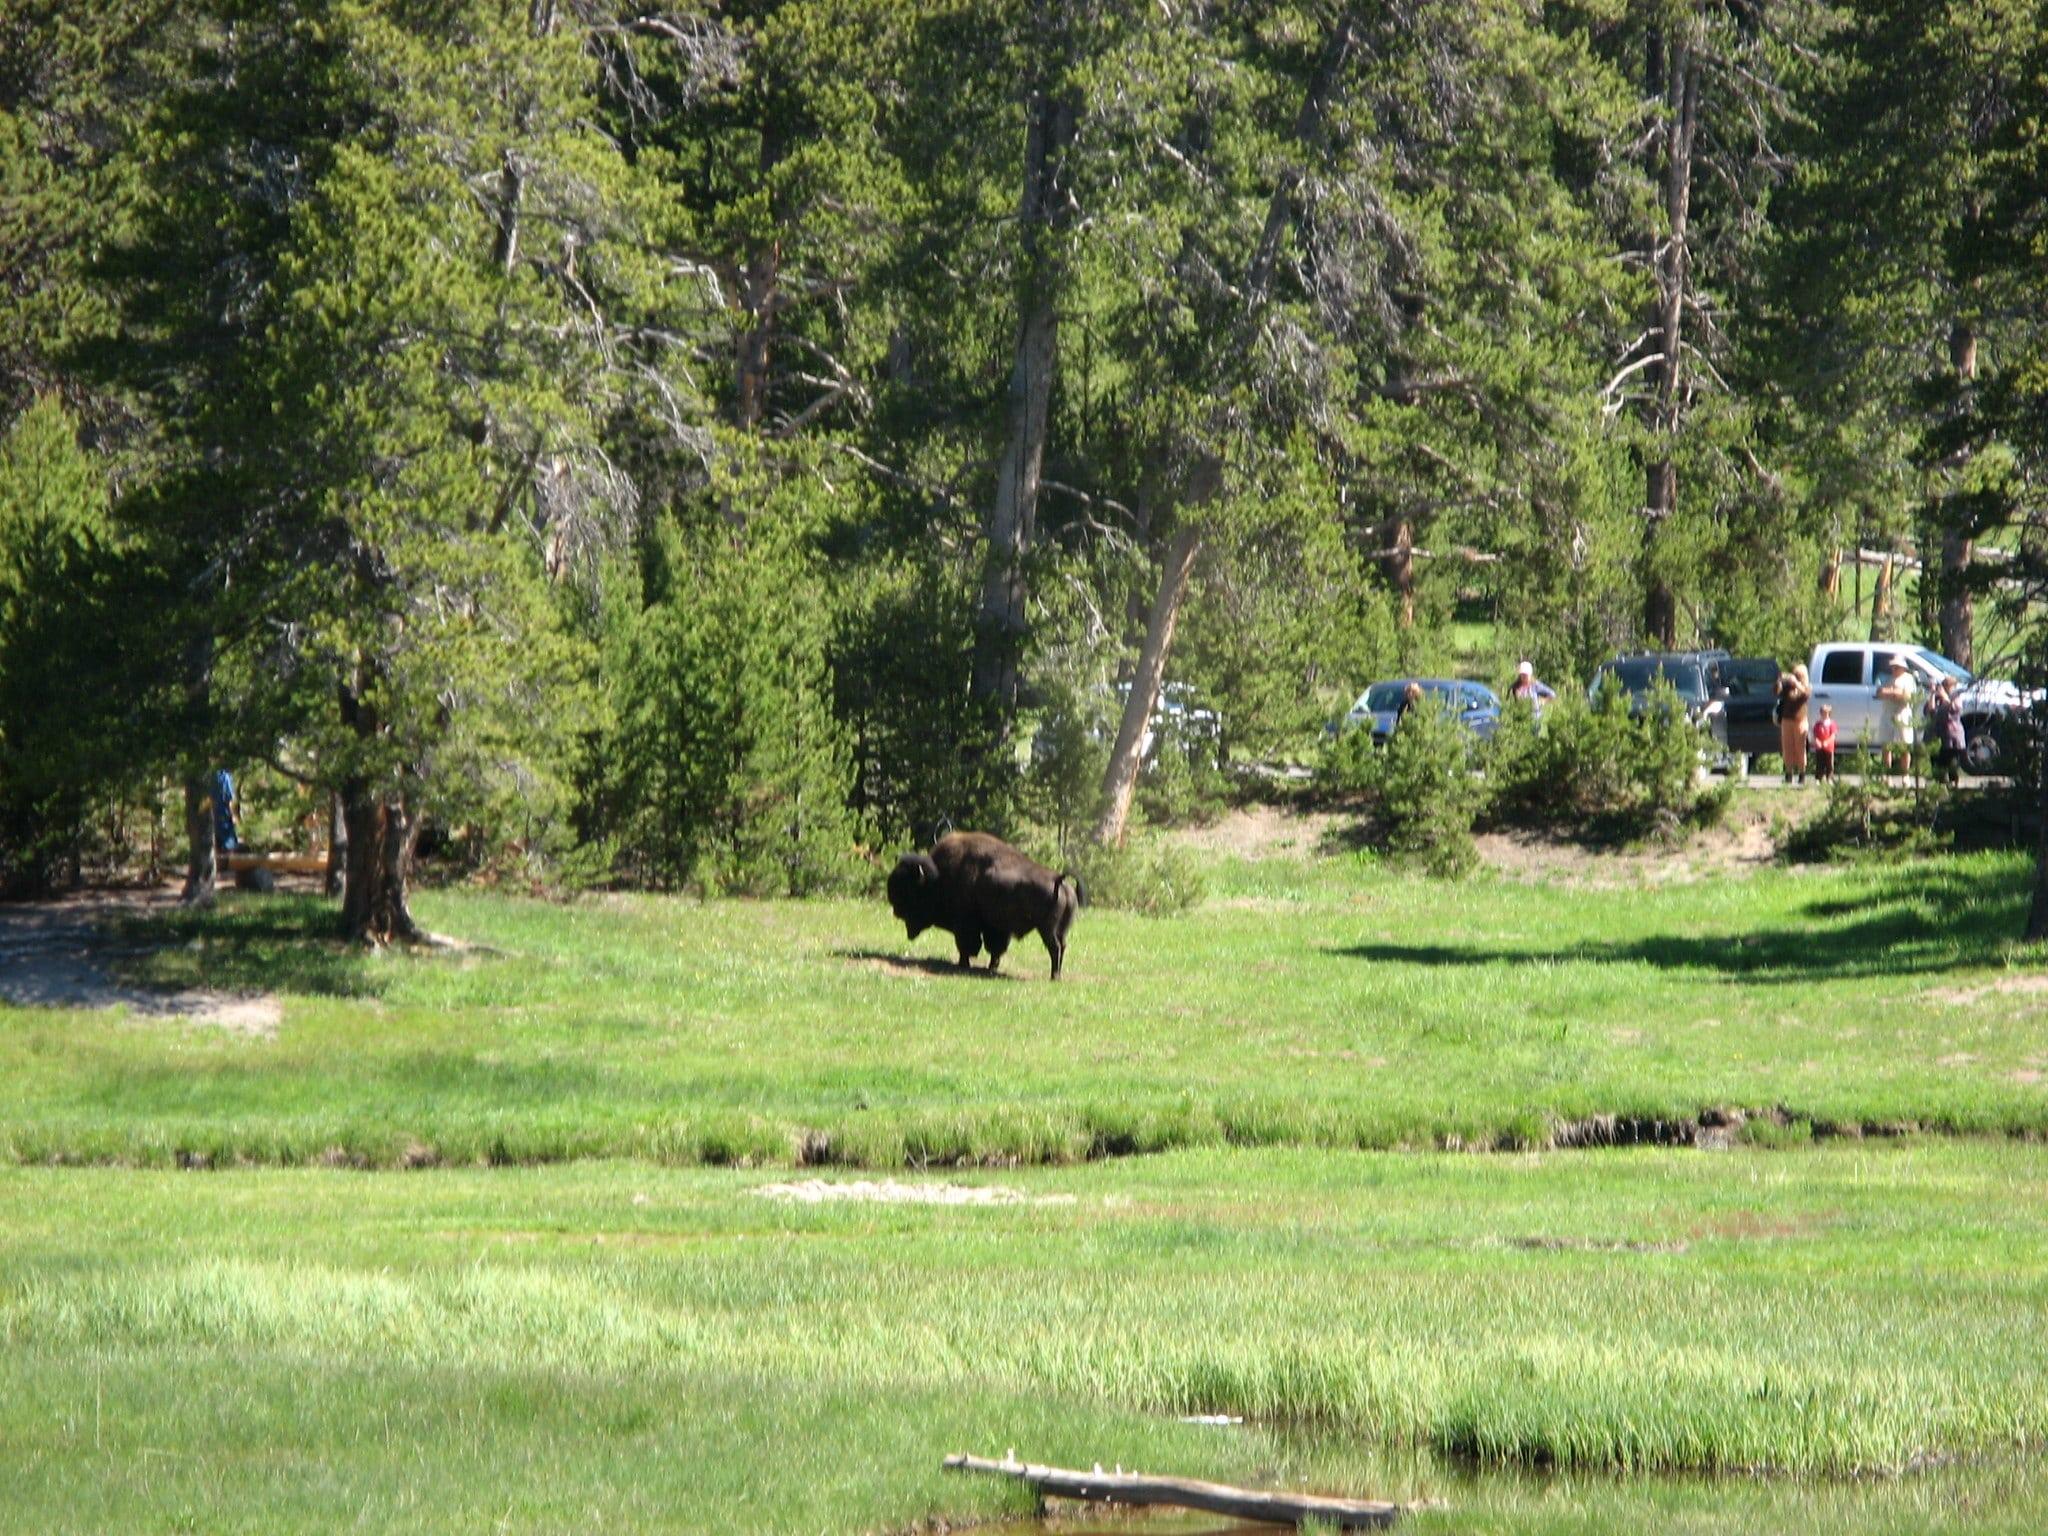 norris campground yellowstone